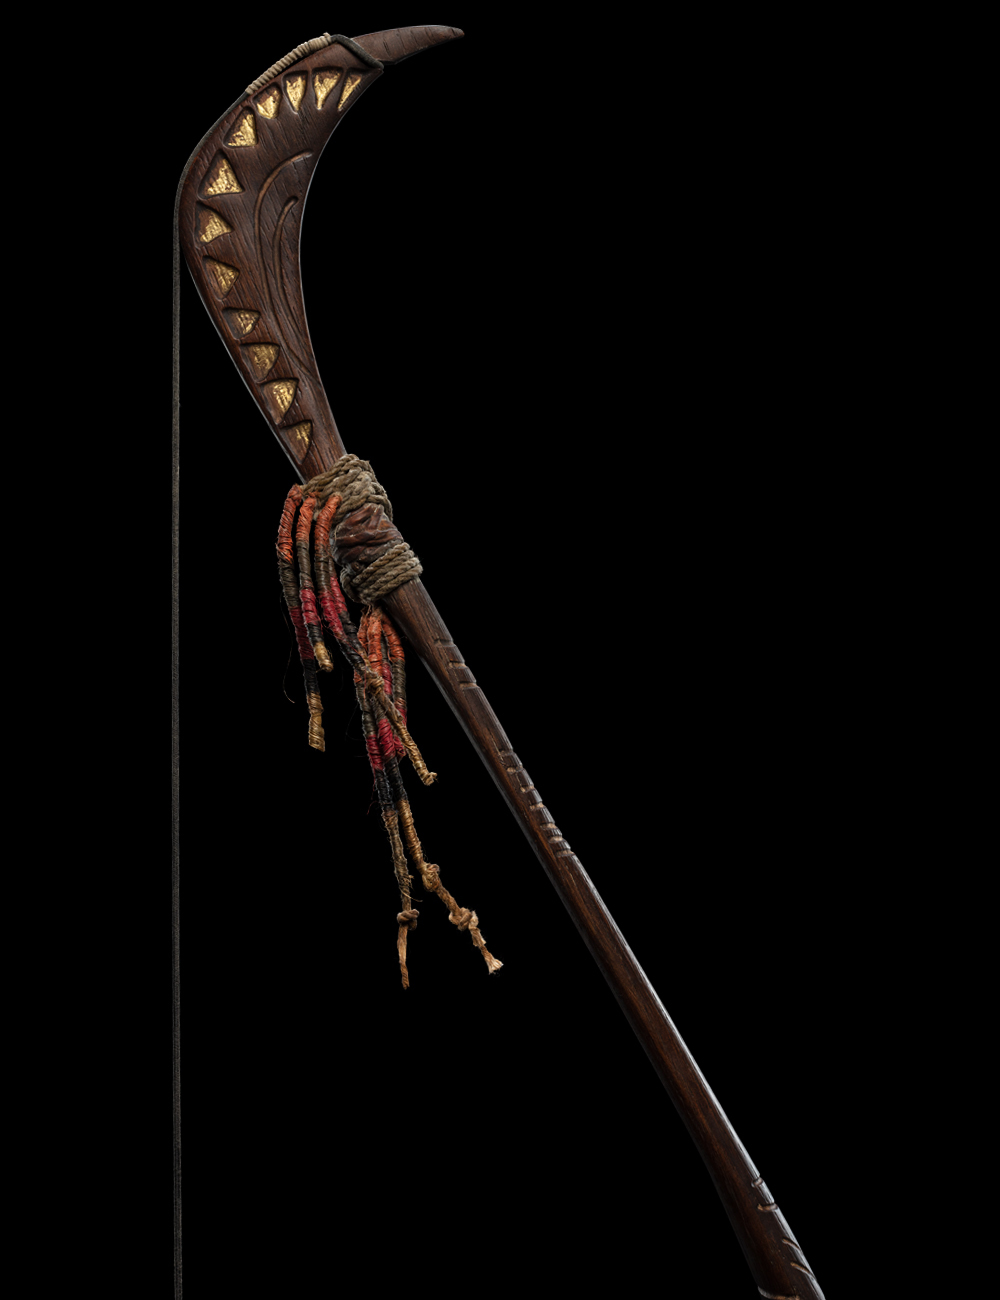 Shadow of the Tomb Raider: Bow & Arrow of Lara Croft image